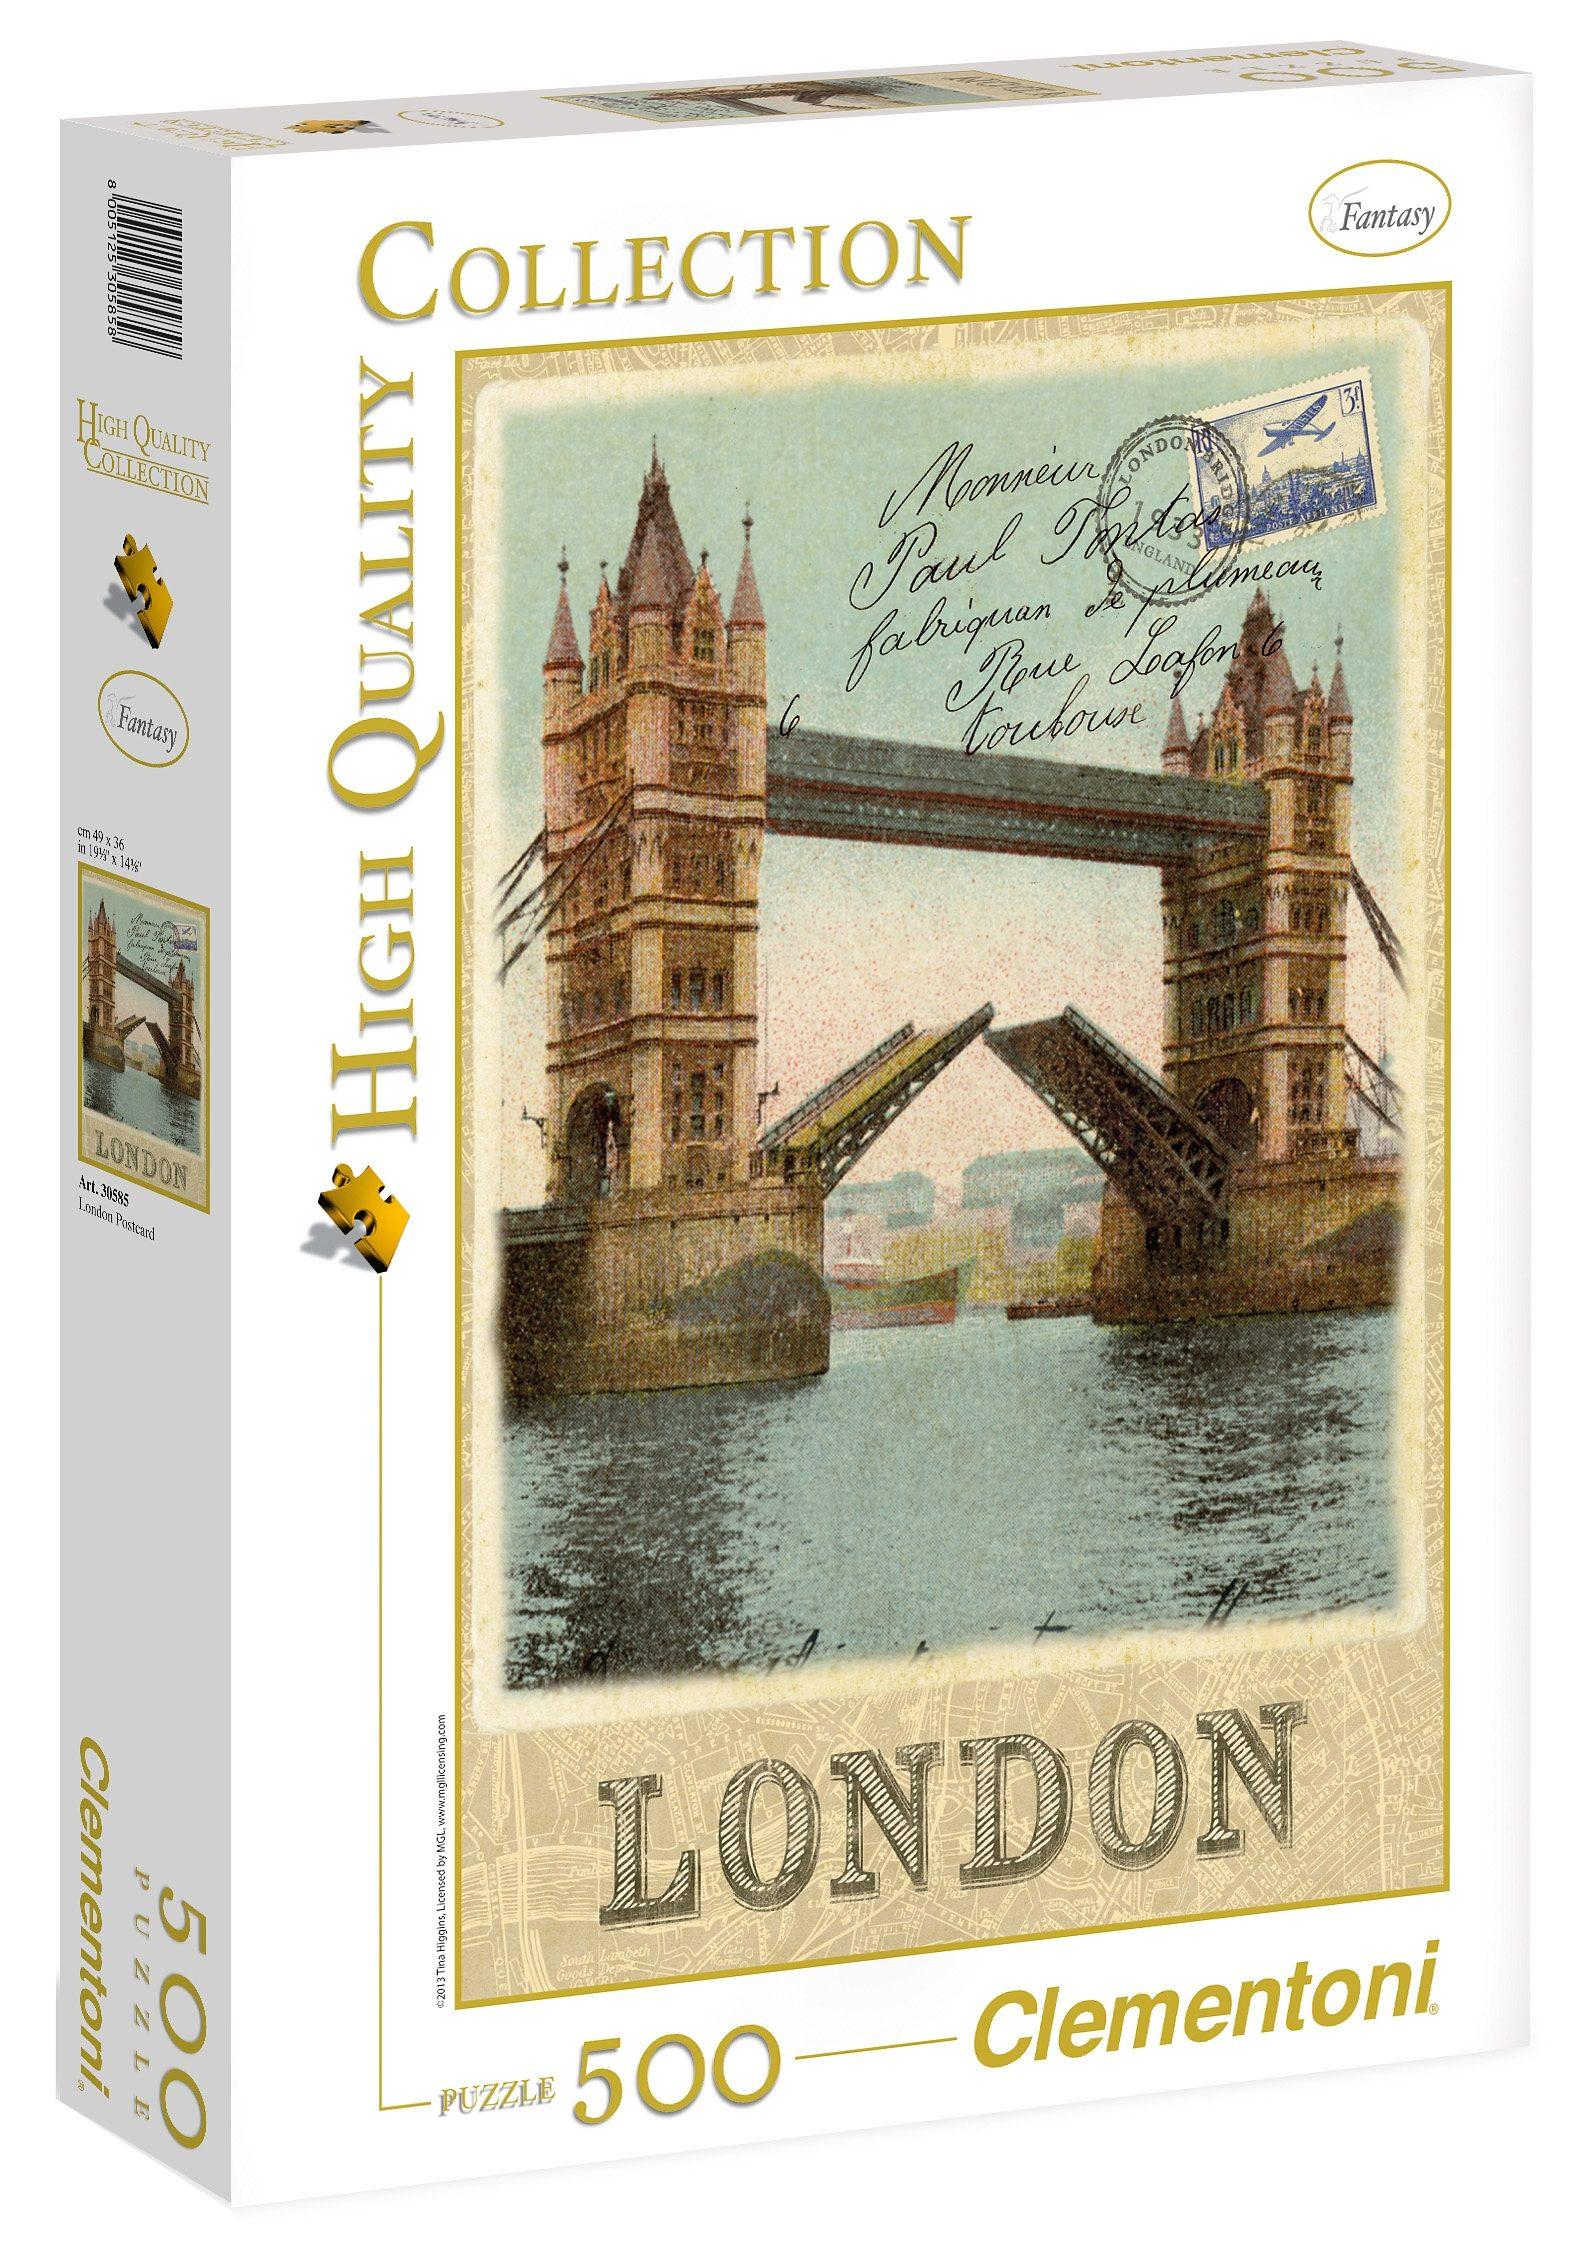 Clementoni Puzzle, 500 Teile, »Londoner Postkarte«